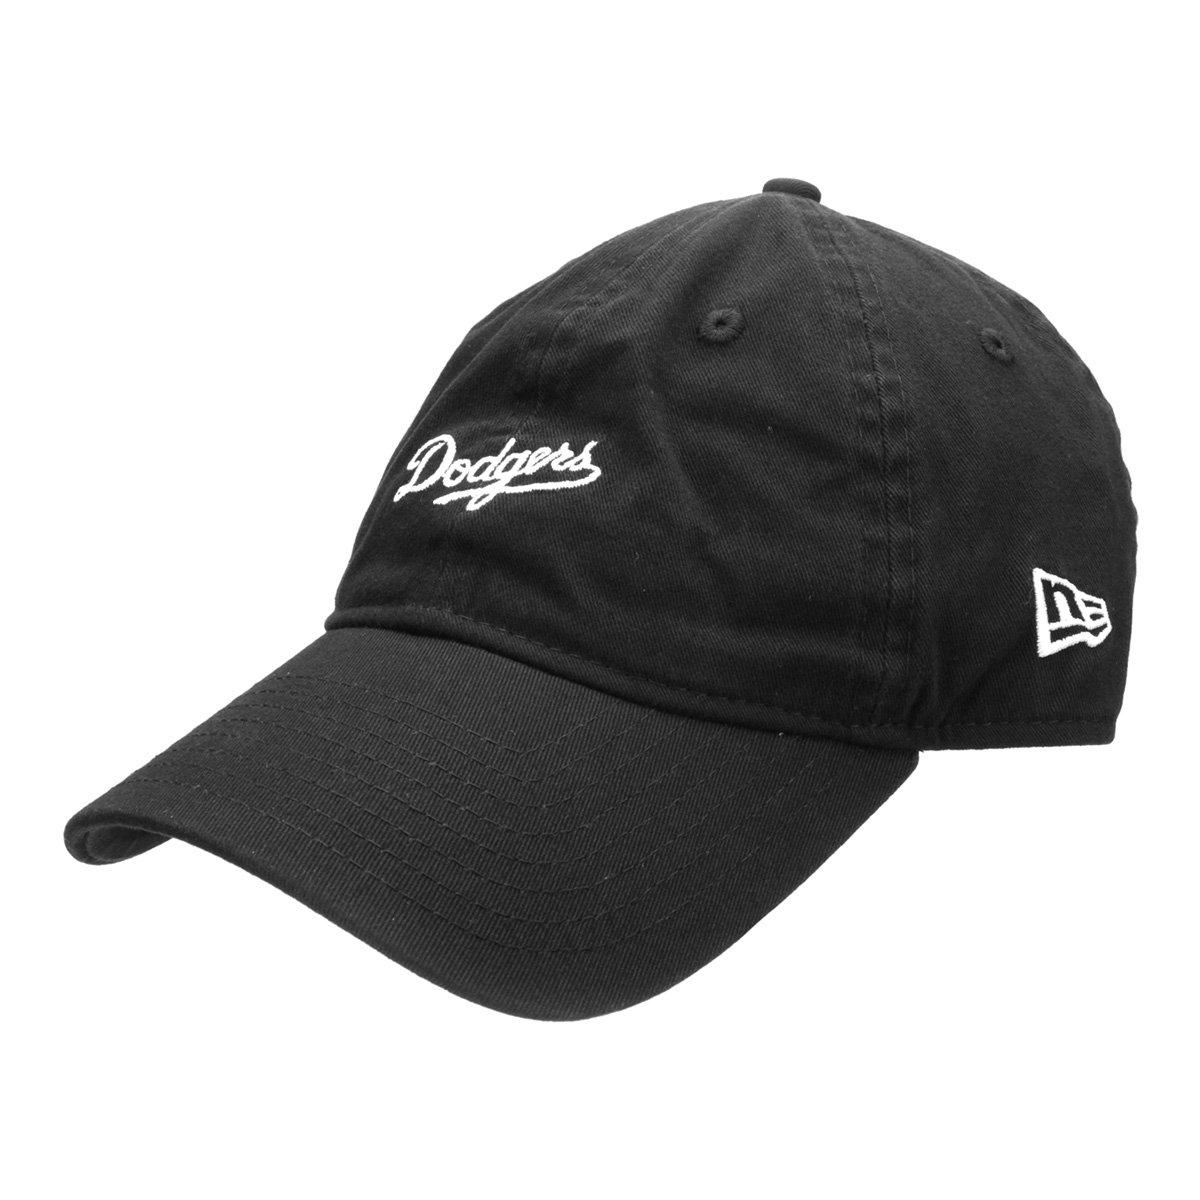 93fc618dcbf67 Boné New Era MLB Los Angeles Dodgers Aba Curva 940 St Lic932 Su17 - Compre  Agora